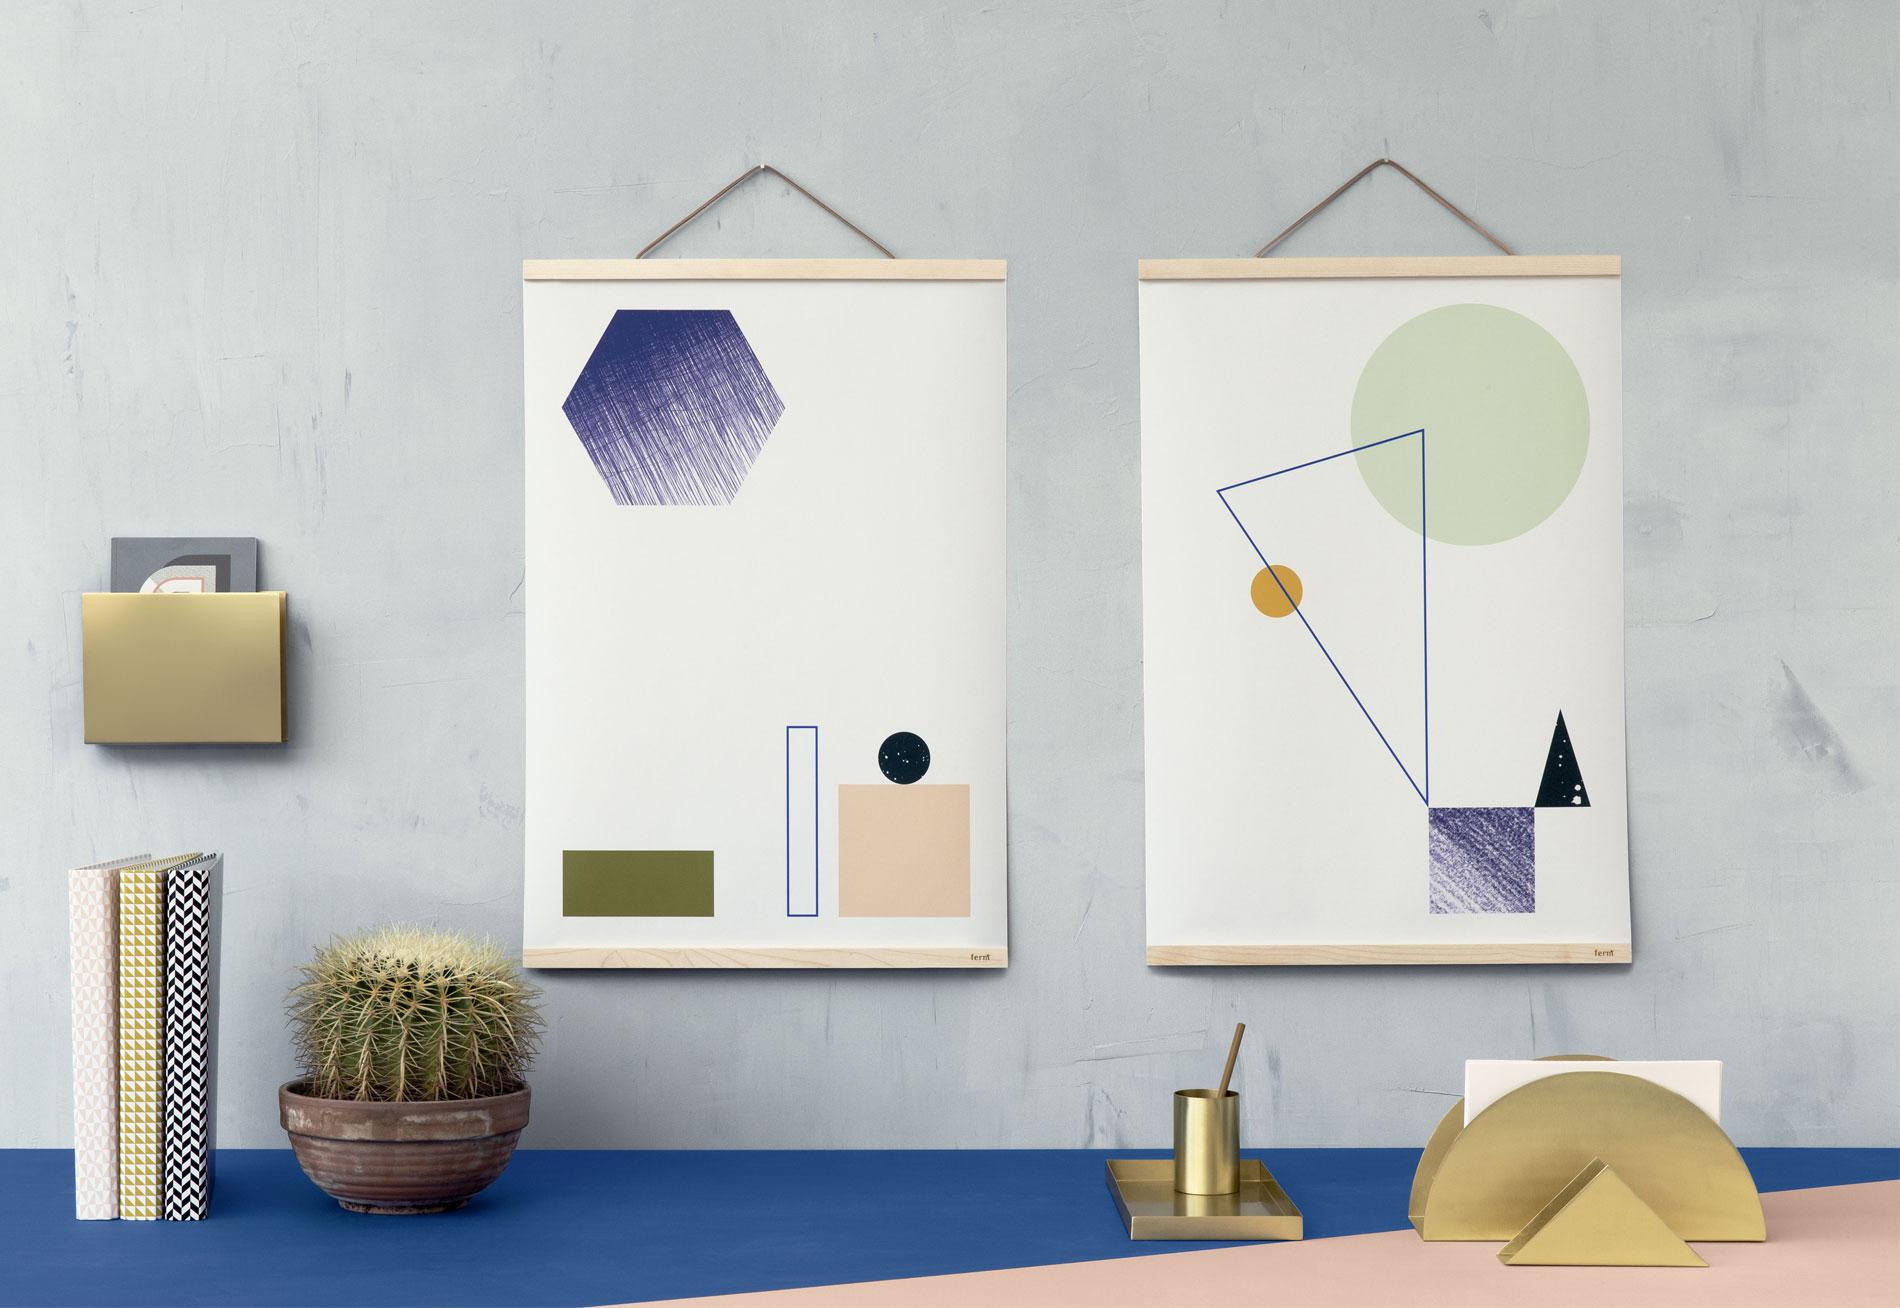 12x de mooiste posters voor in je interieur - Ferm Living